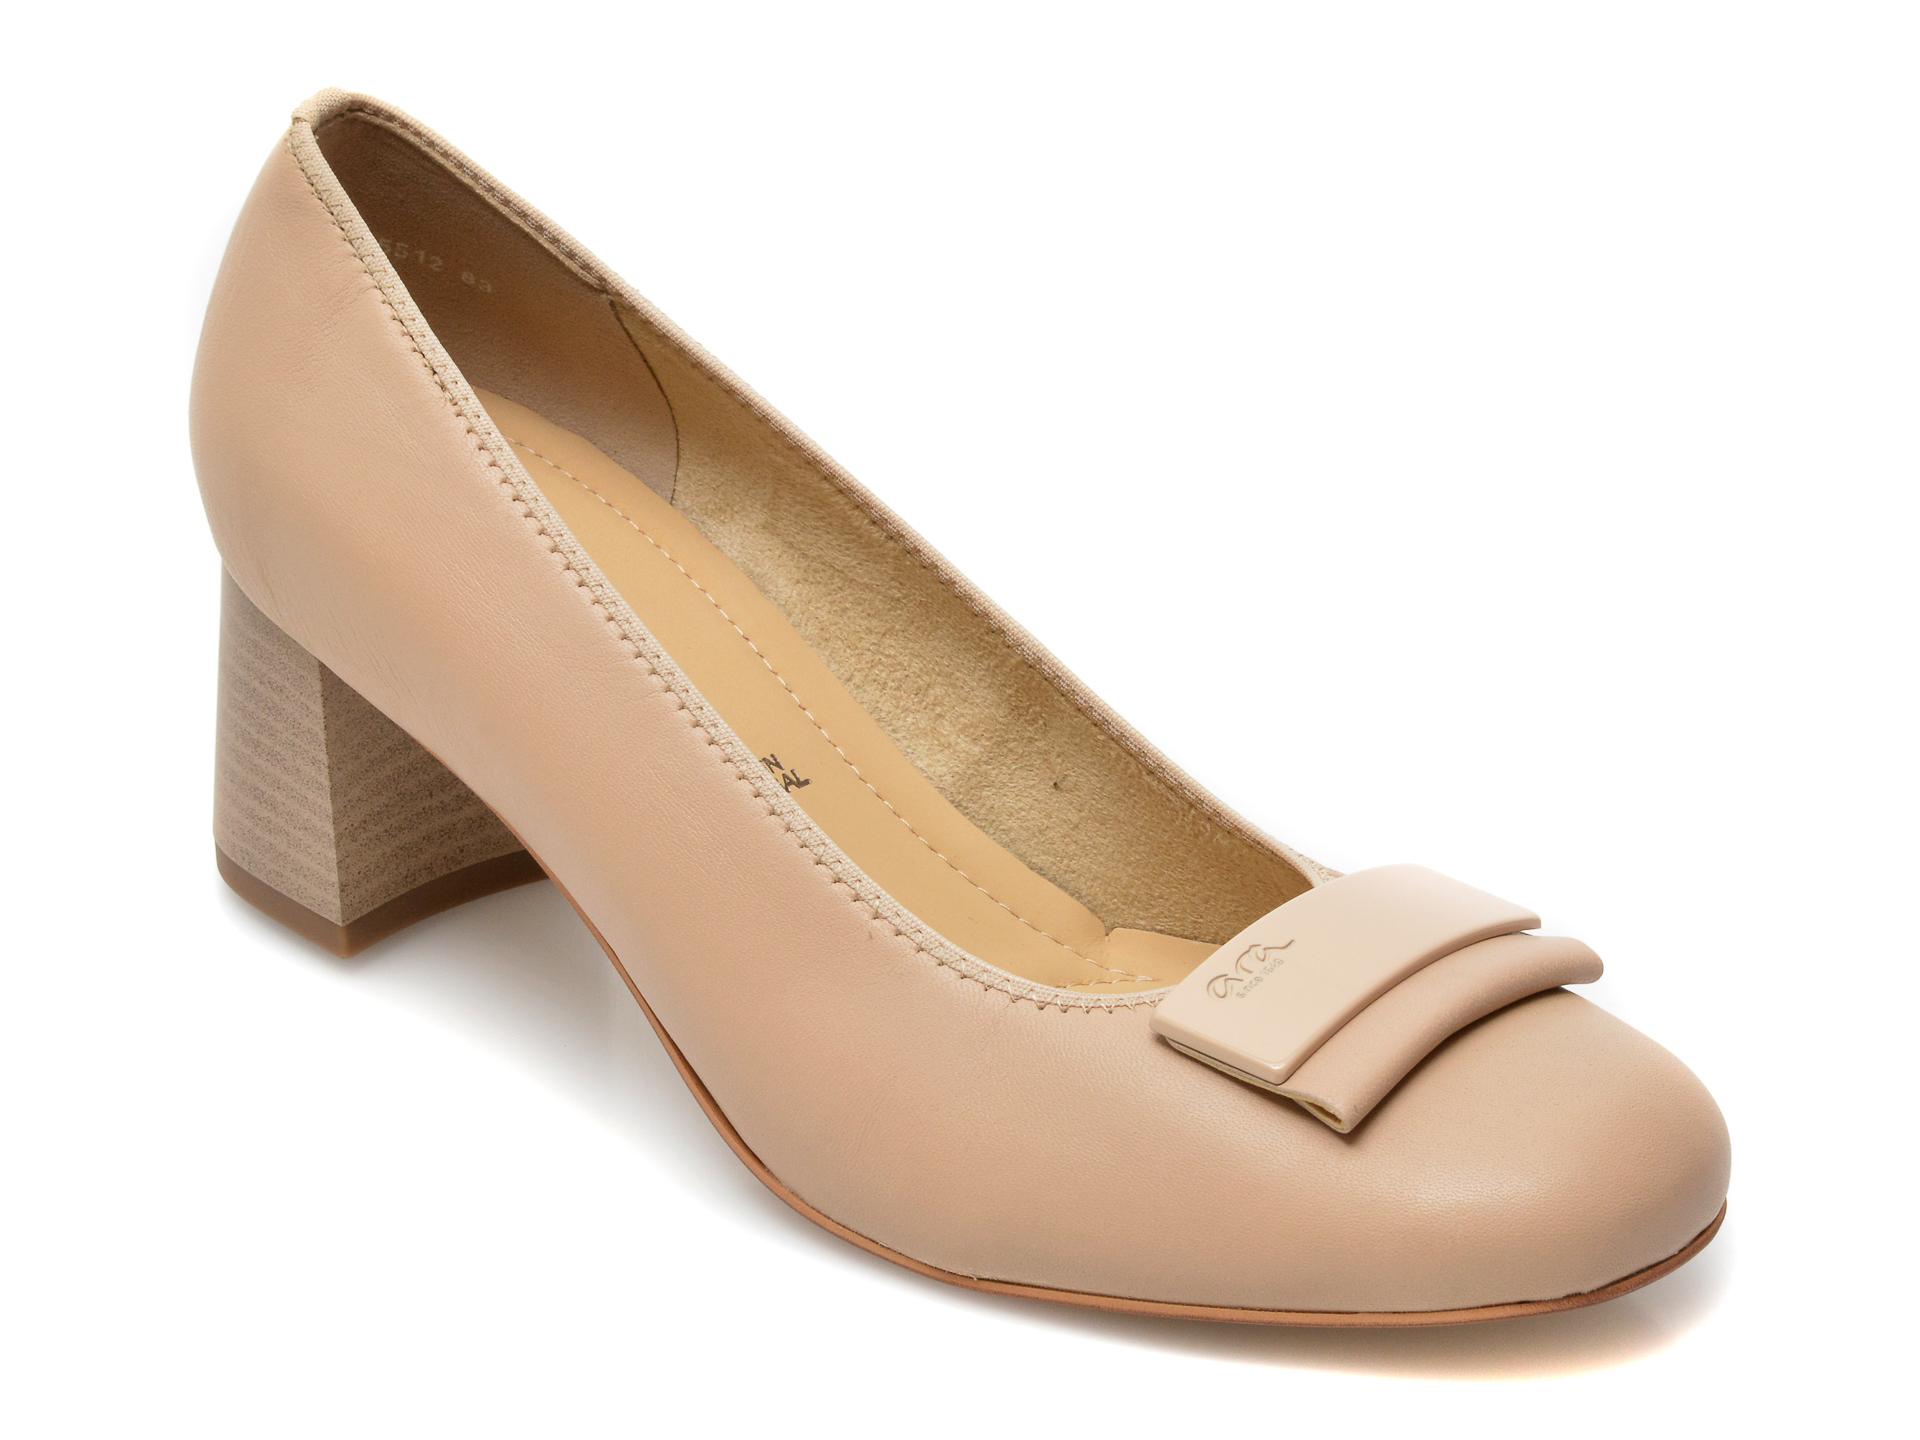 Pantofi ARA nude, 35512, din piele naturala imagine otter.ro 2021